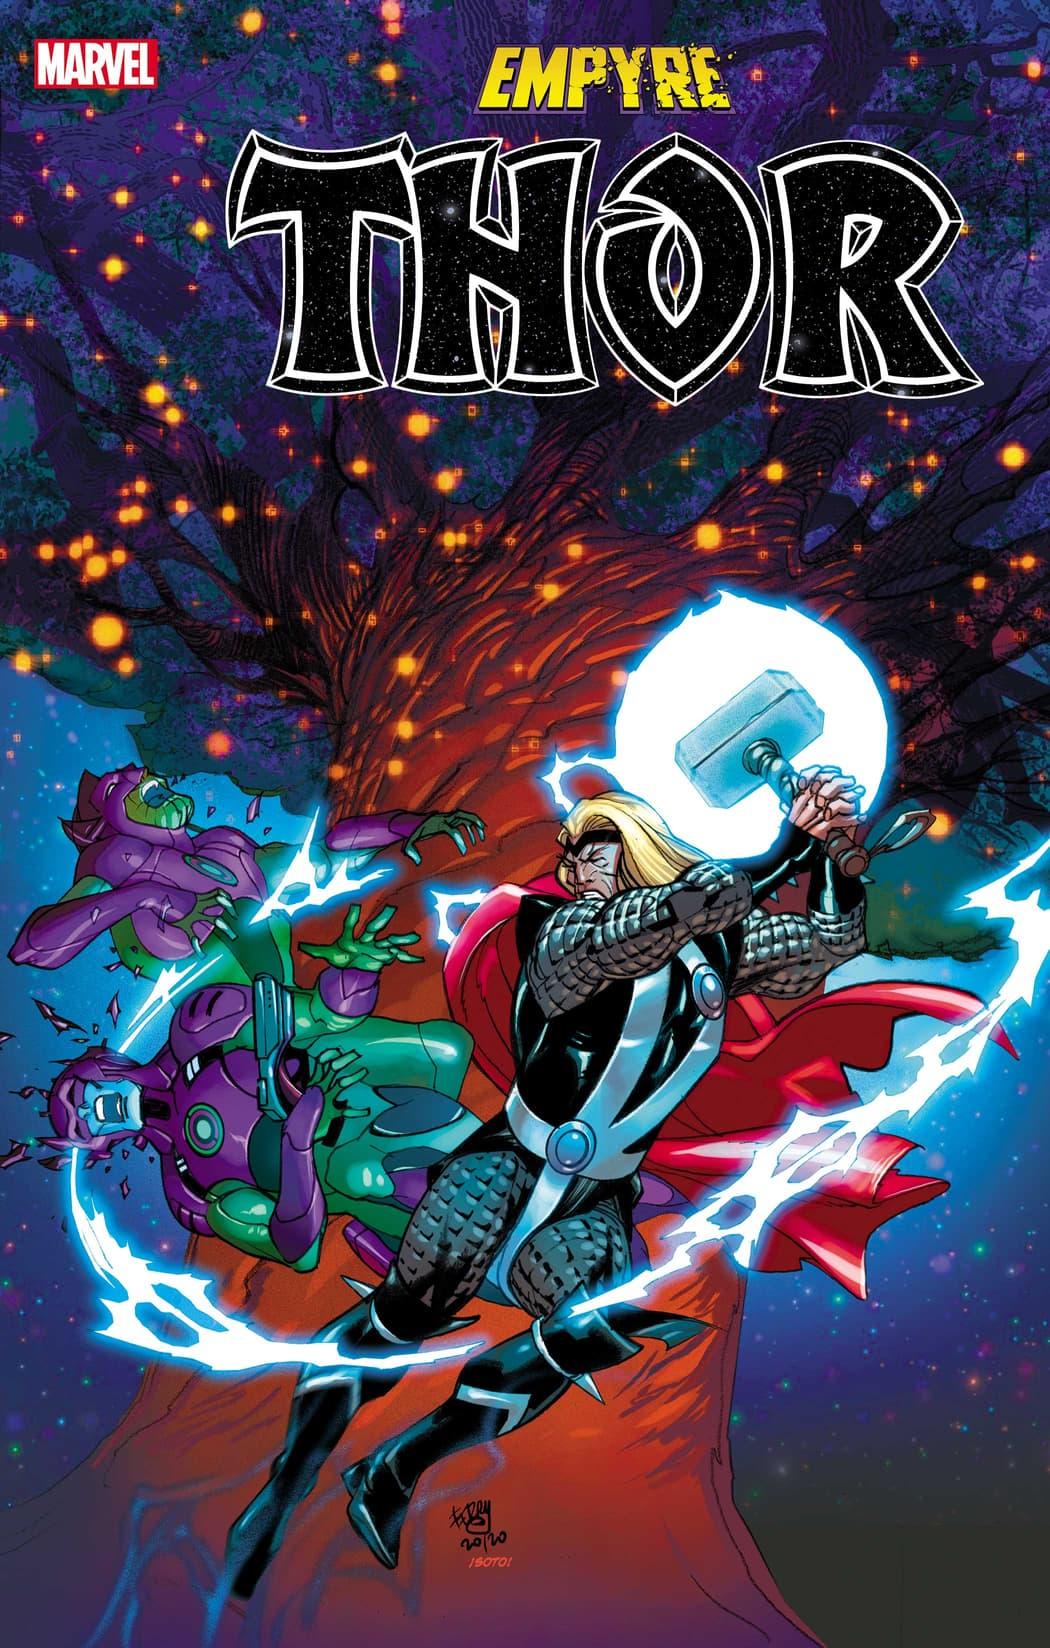 Empyre: Thor